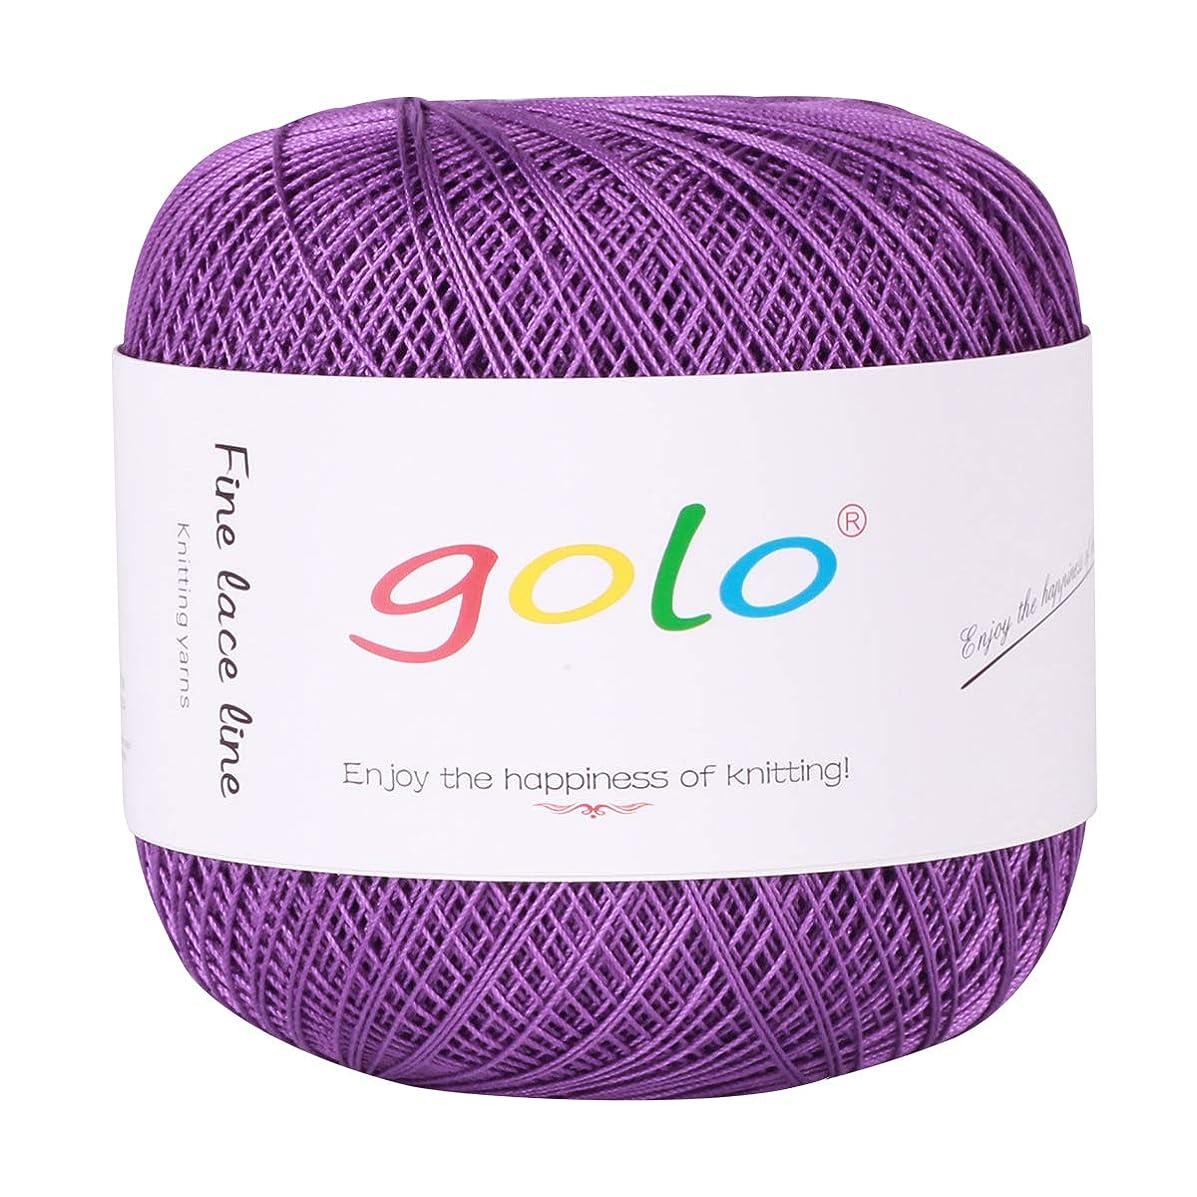 Crochet Thread Yarns for Begingers Size8-100% Contton Yarn for Knitting Crochet DIY Hardanger Cross Sitch Crochet Thread Balls Rainbow Turquoise 31 Colors Avilable (Violet)